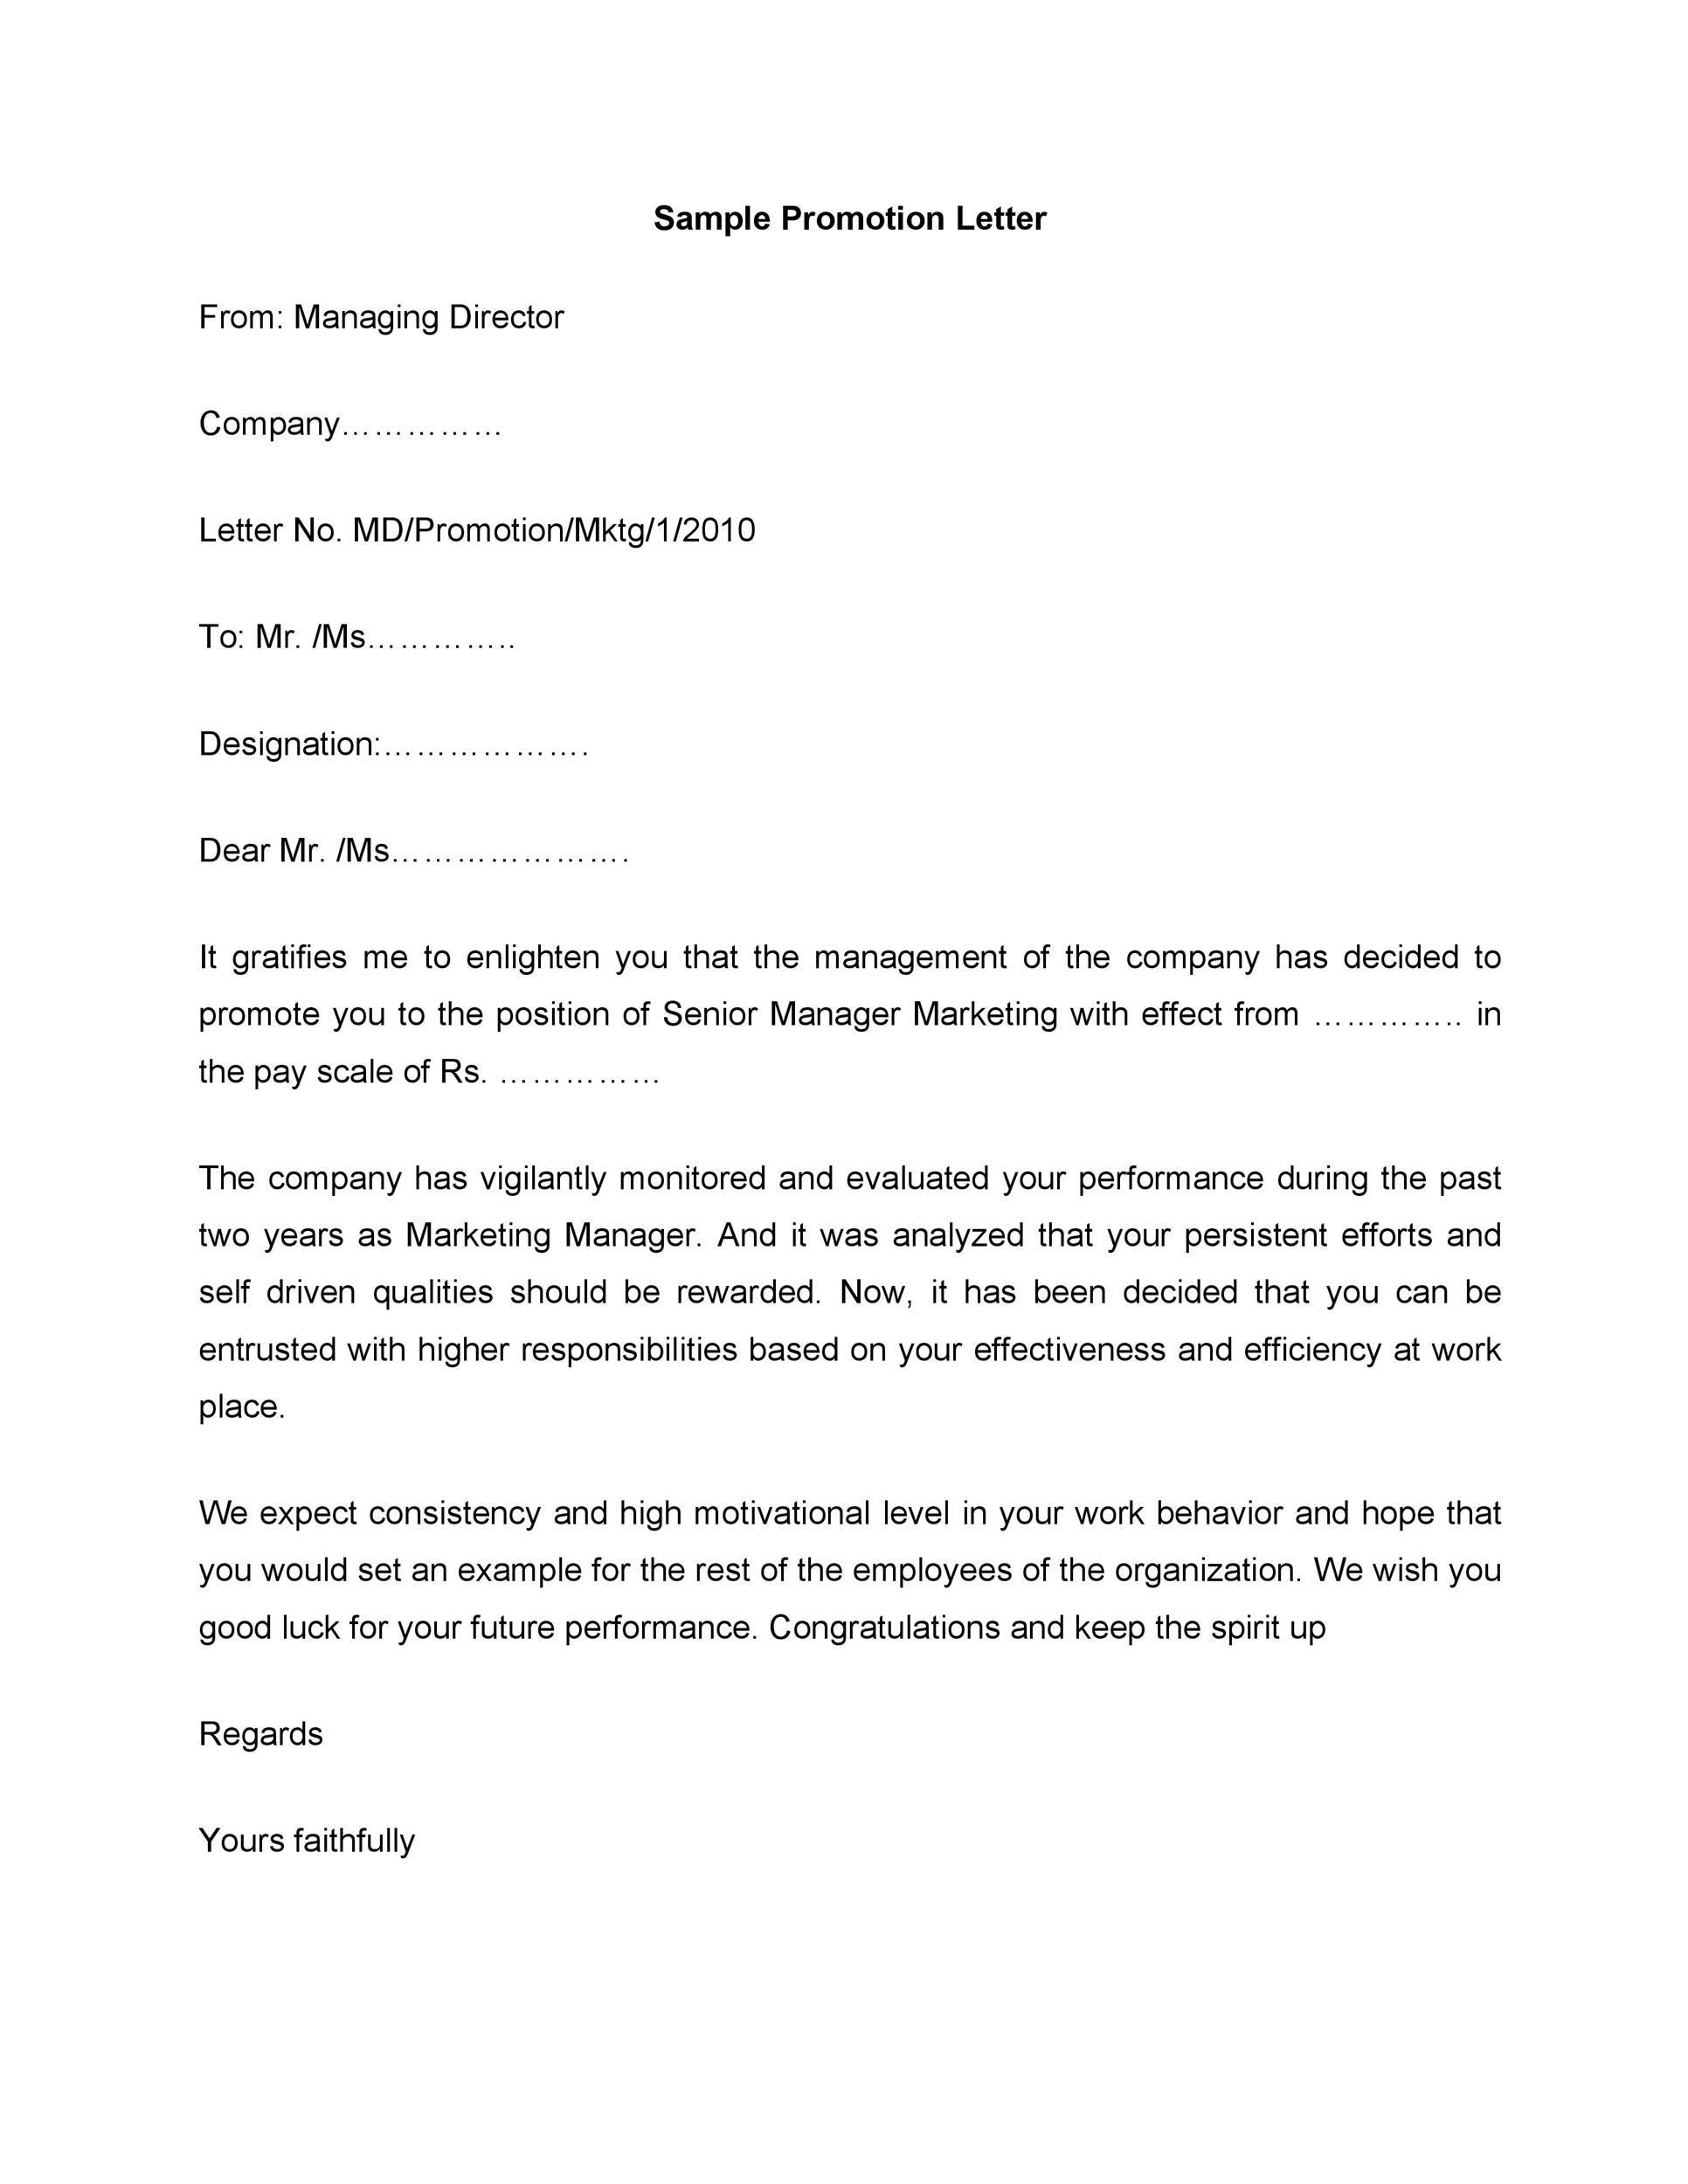 Free promotion letter 32